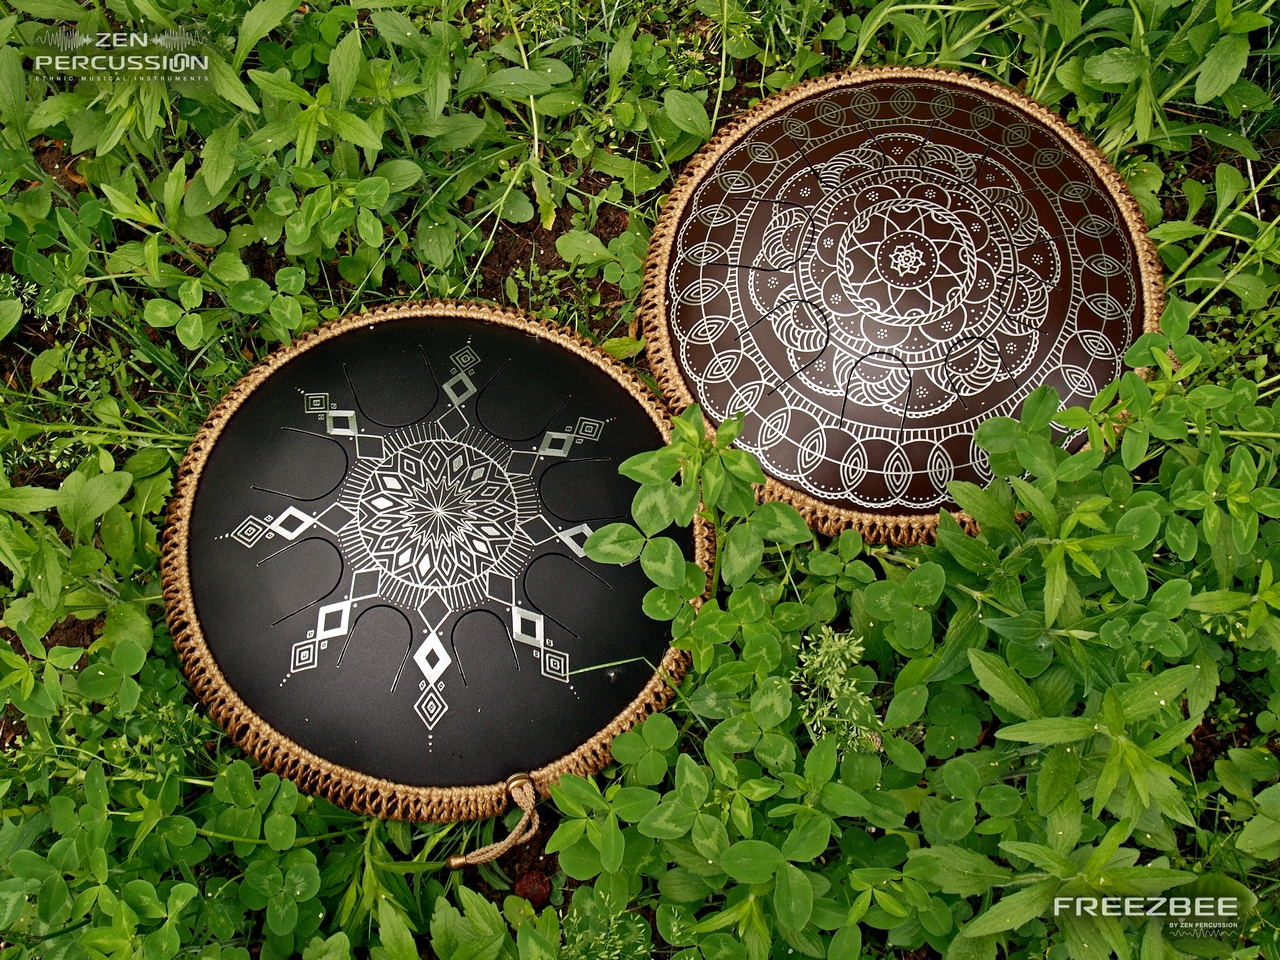 guda freezbee handpan drum. Black Bedroom Furniture Sets. Home Design Ideas